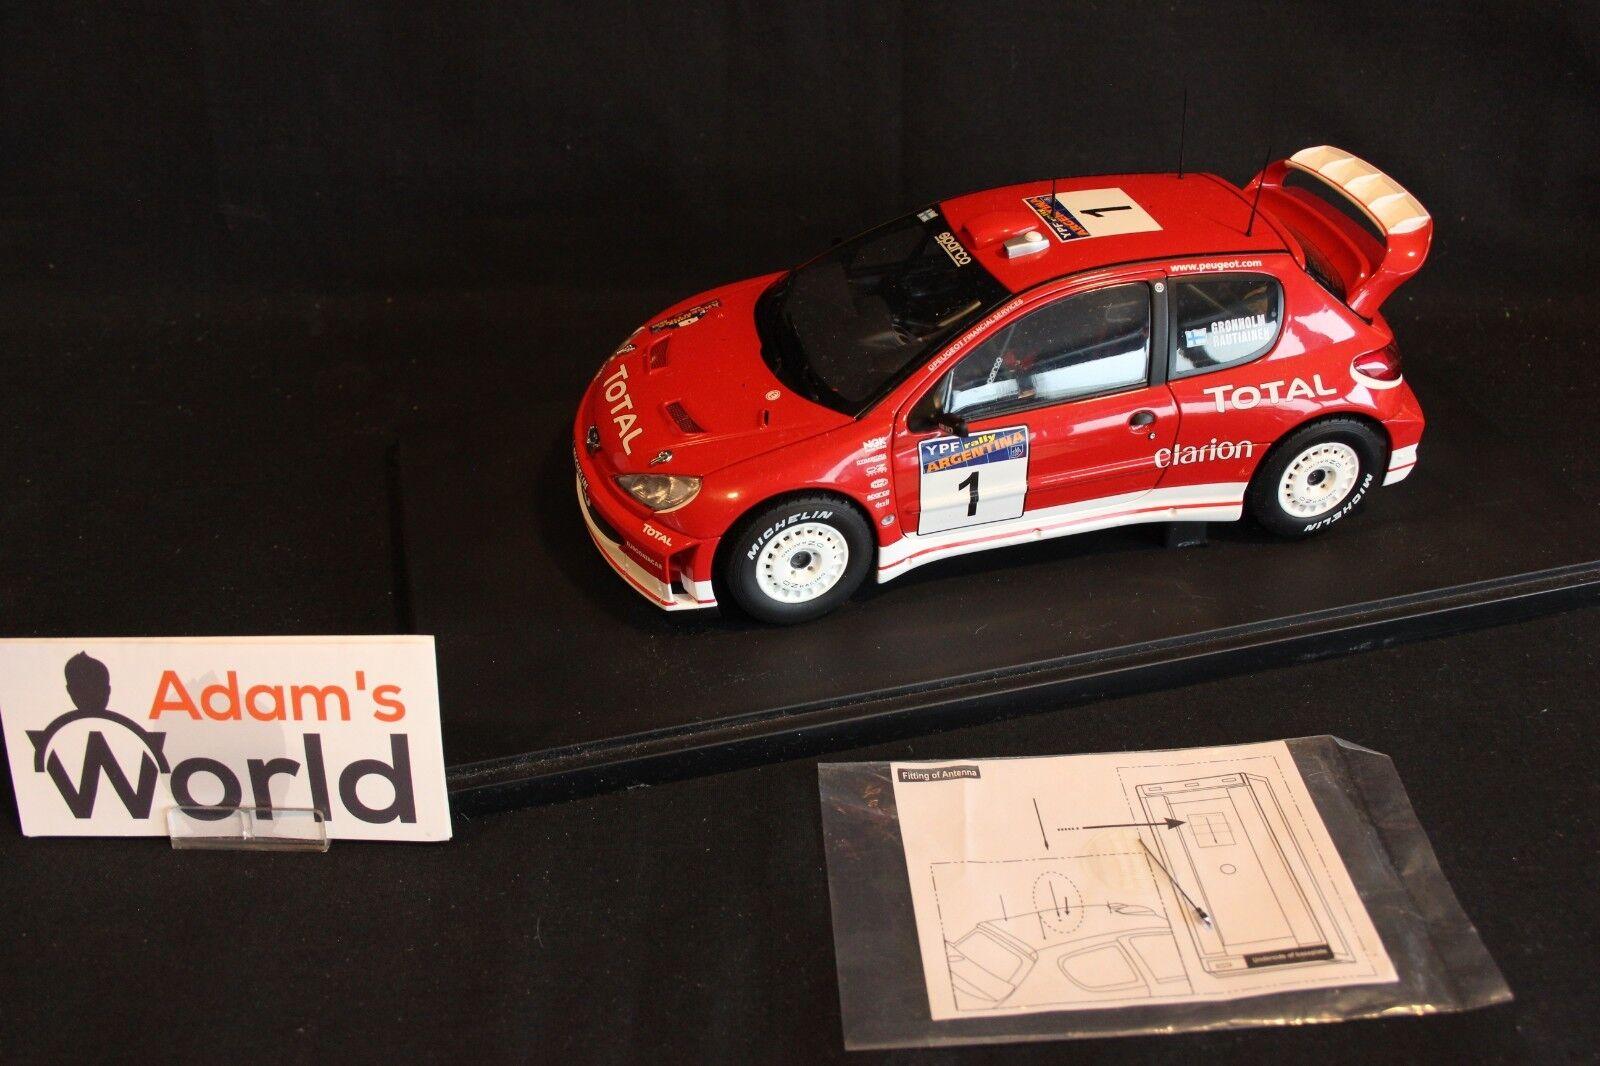 AutoArt Peugeot 206 WRC 2003 1 18  2 Burns   Reid Rallye MC (AK)